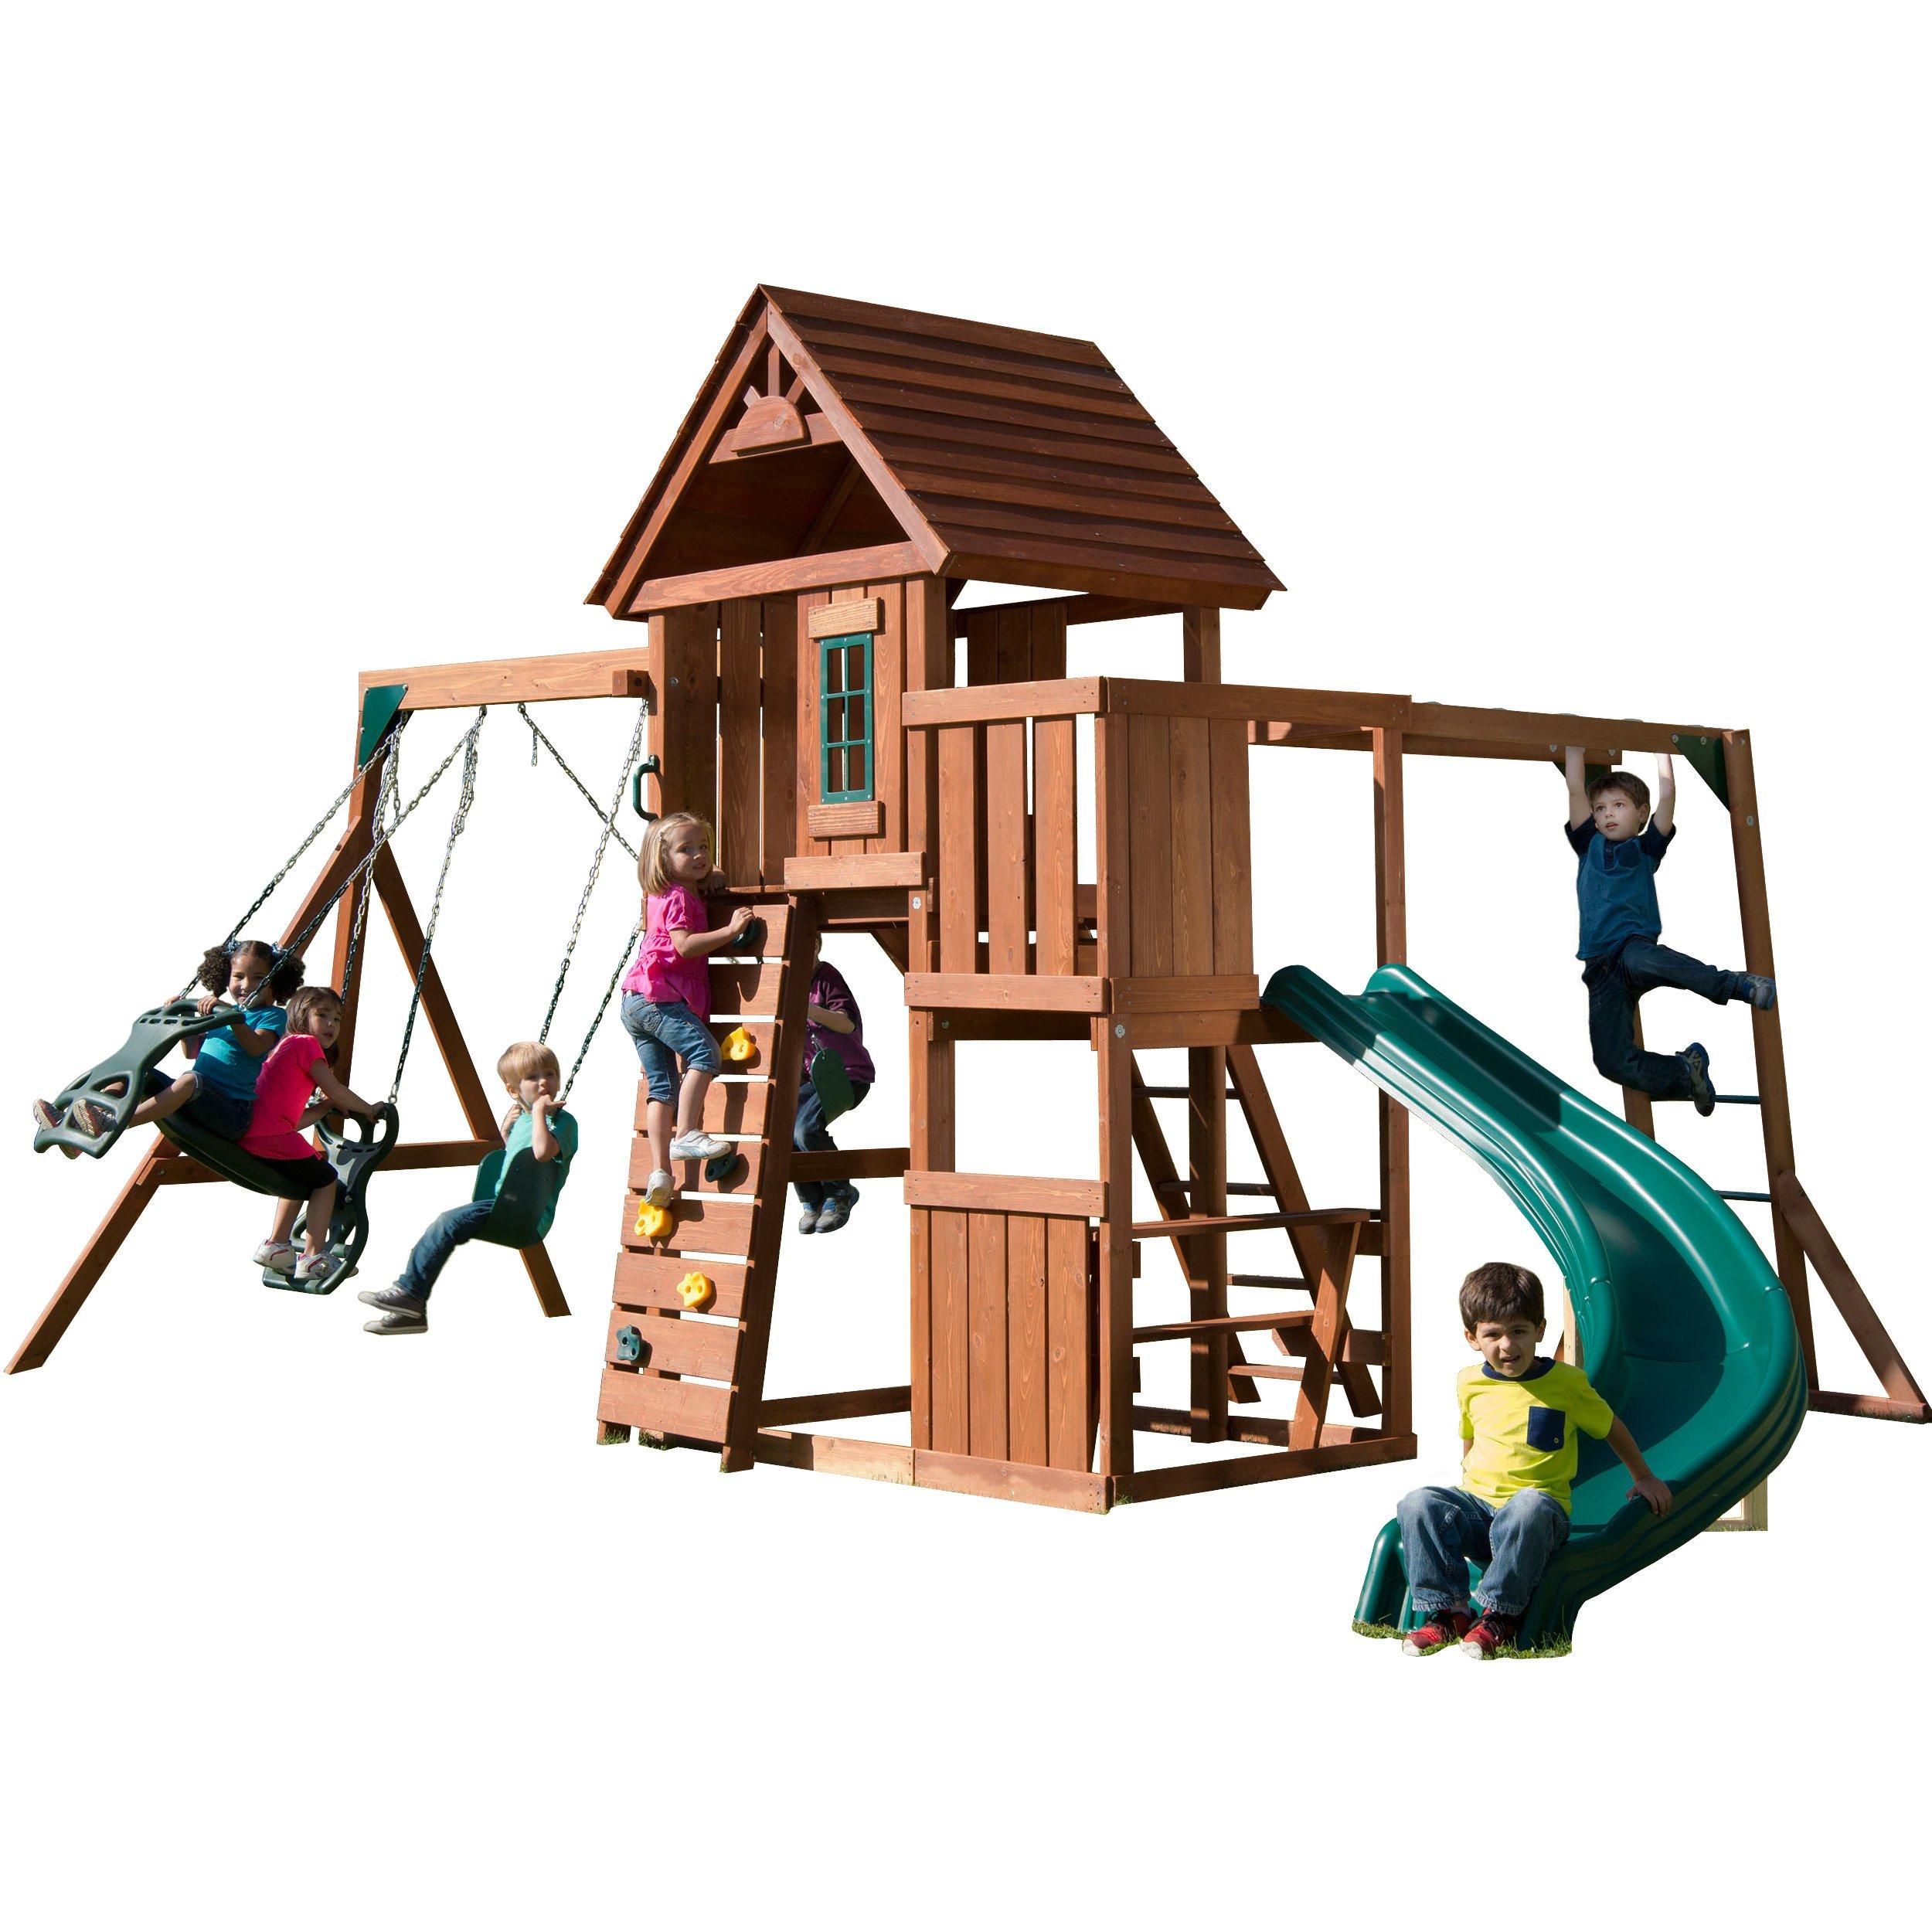 Swing-N-Slide Cedar Brook Play Set with Two Swings, Slide, Monkey Bars, Picnic Table and Glider